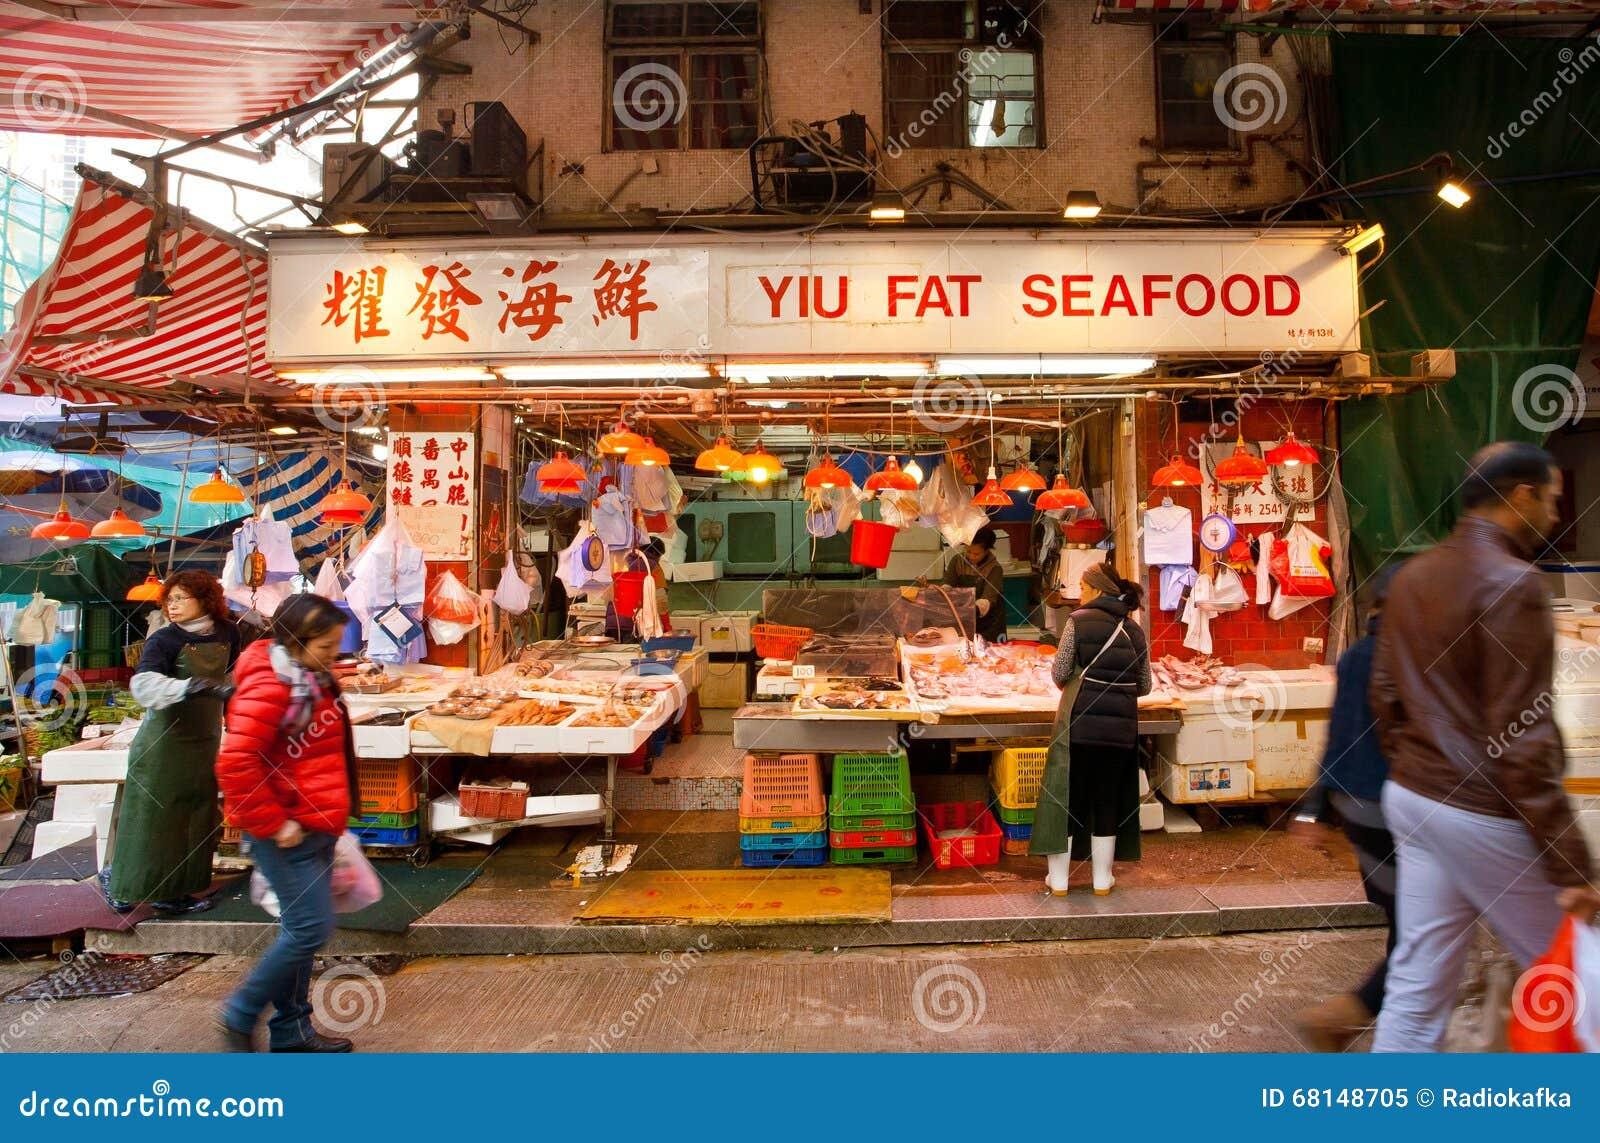 60 Seafood City Marketplace Mall Photos ...